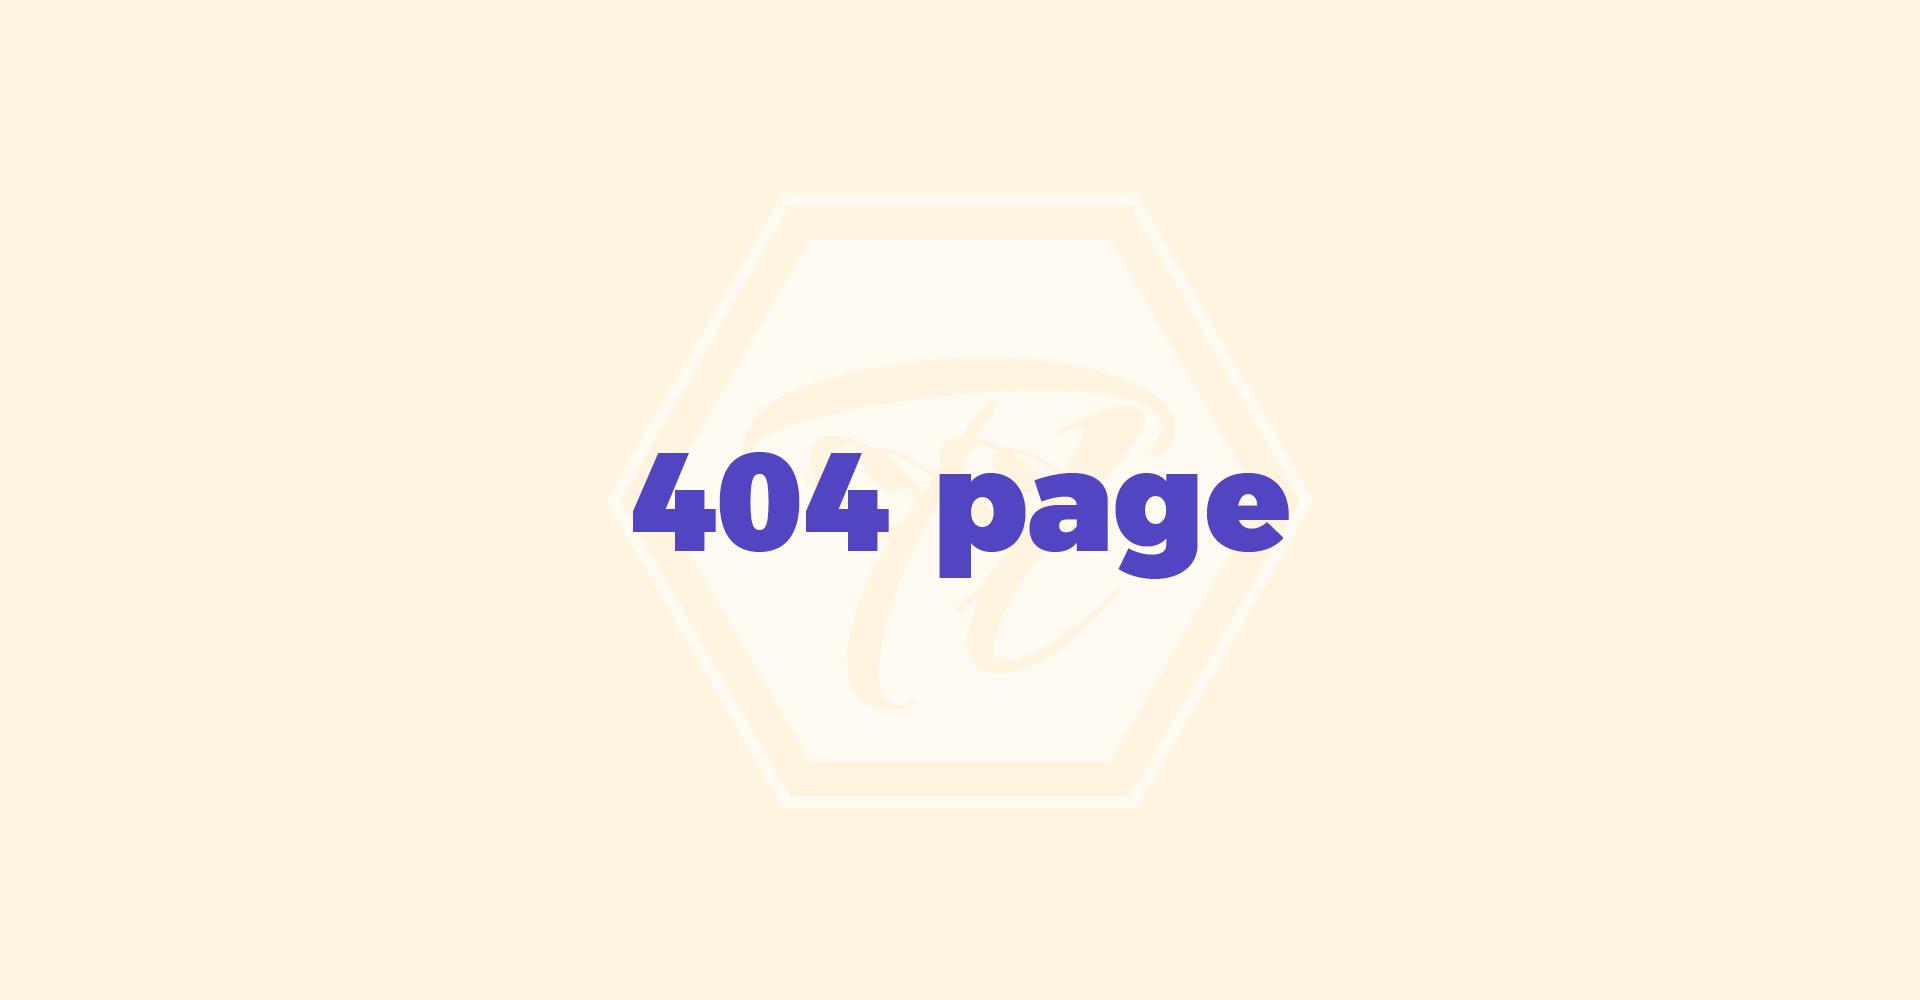 404 1 1 2